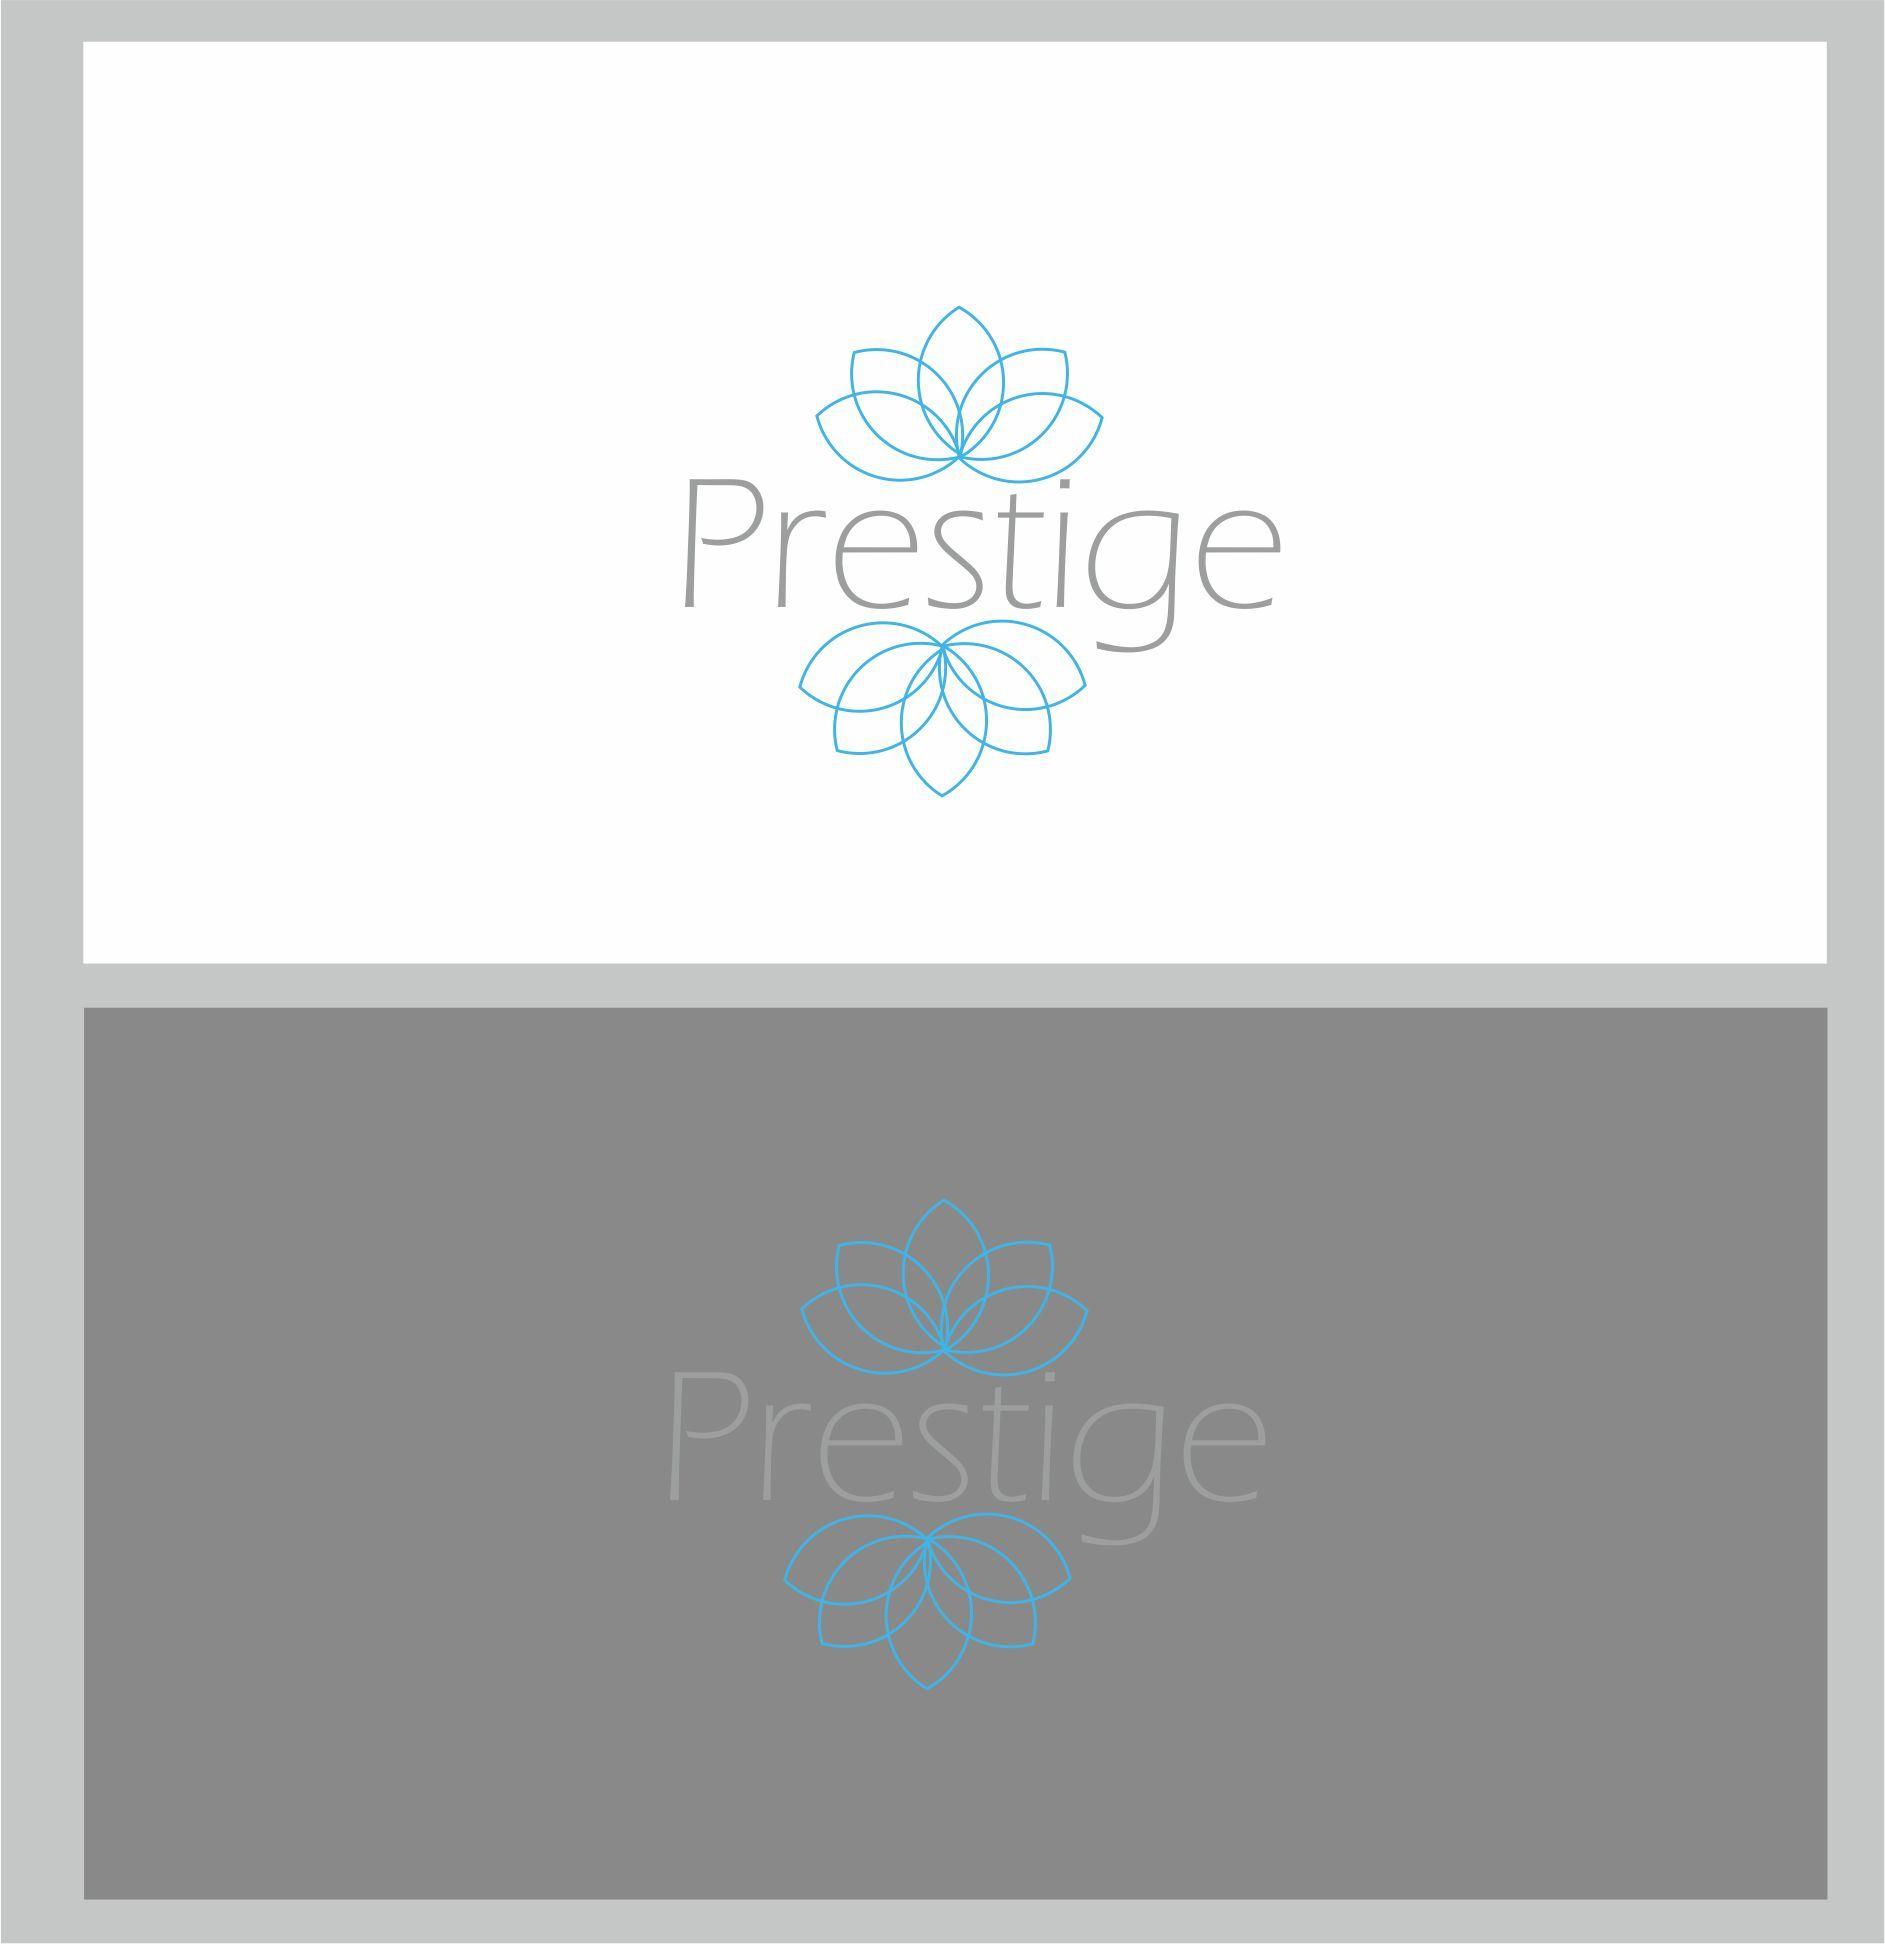 Логотип для свадебного агентства Prestige - дизайнер dbyjuhfl